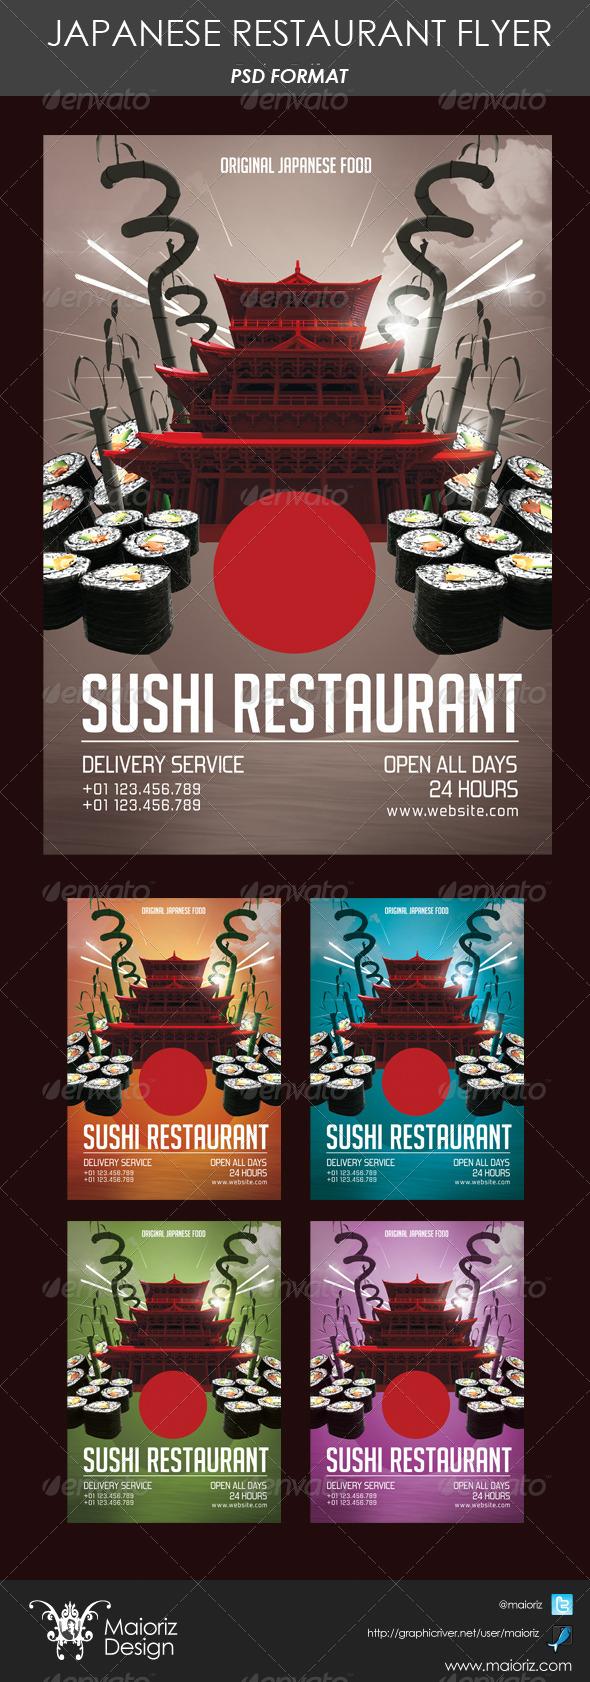 GraphicRiver Japanese Restaurant Flyer 6033206